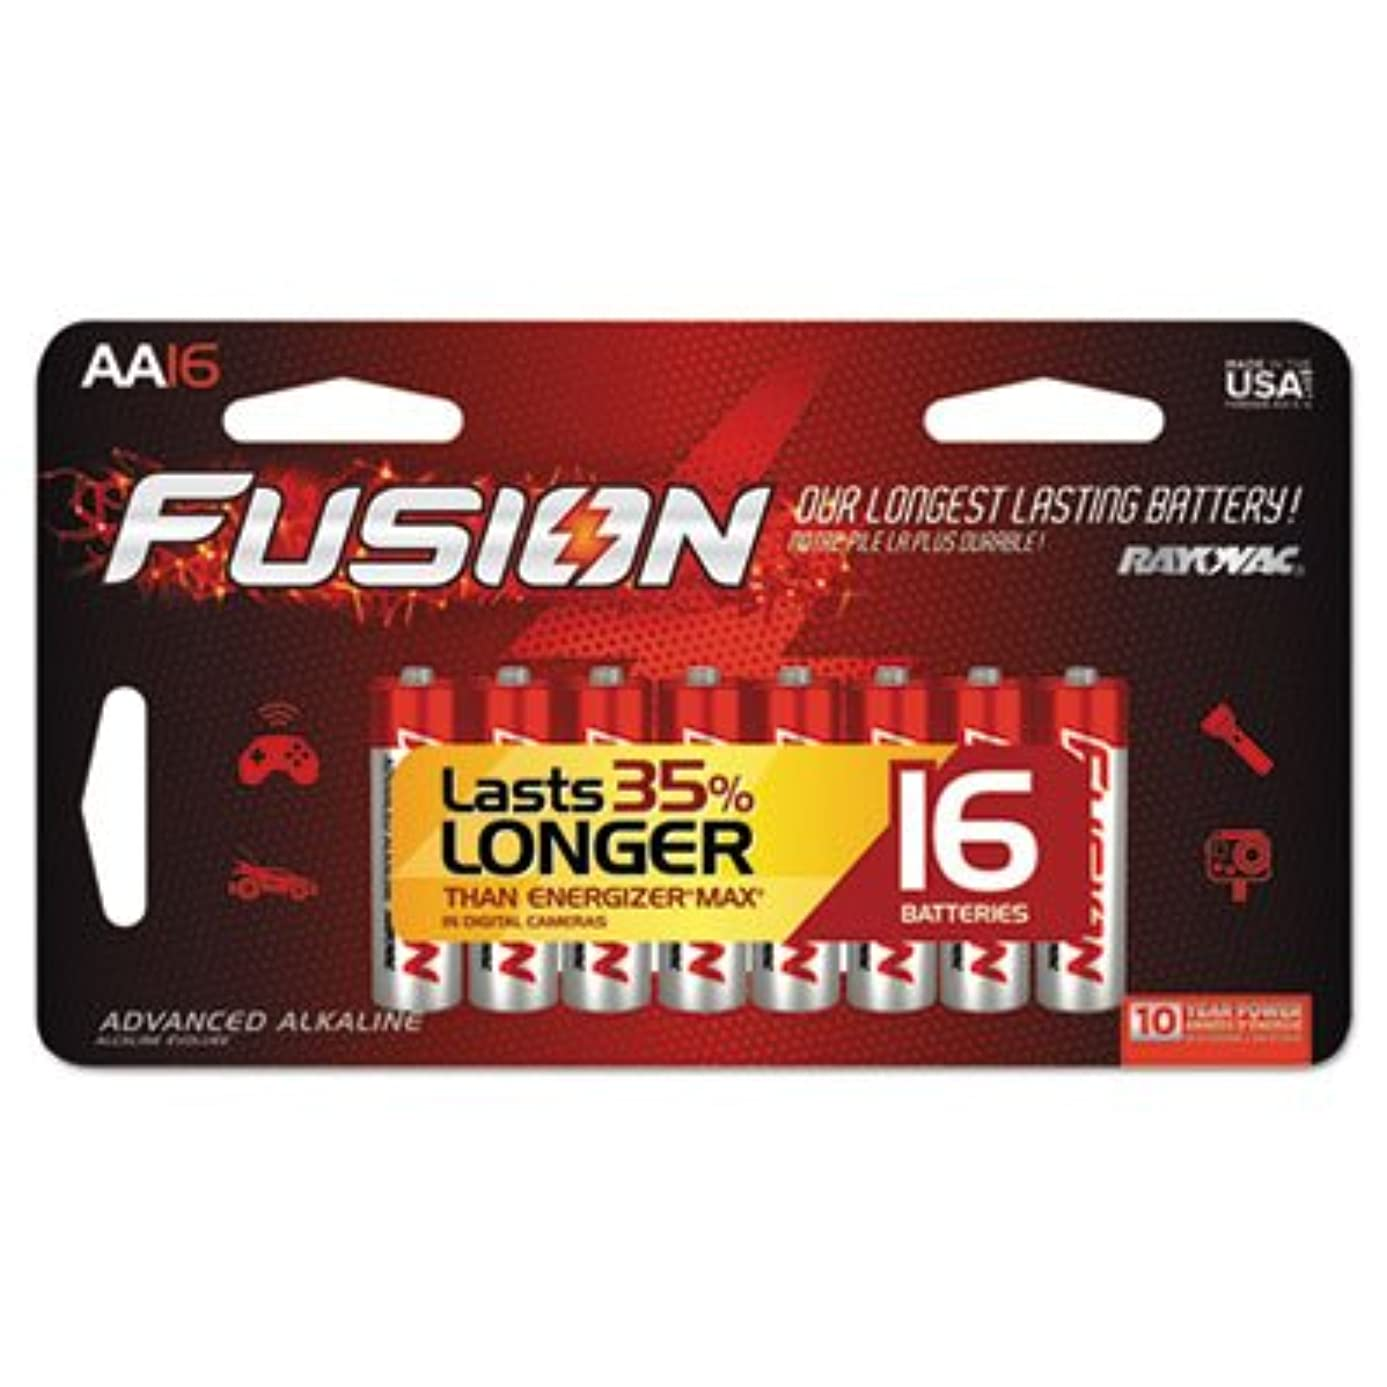 Rayovac 81516SCTFUS Fusion Advanced Alkaline Batteries AA 16/Pack